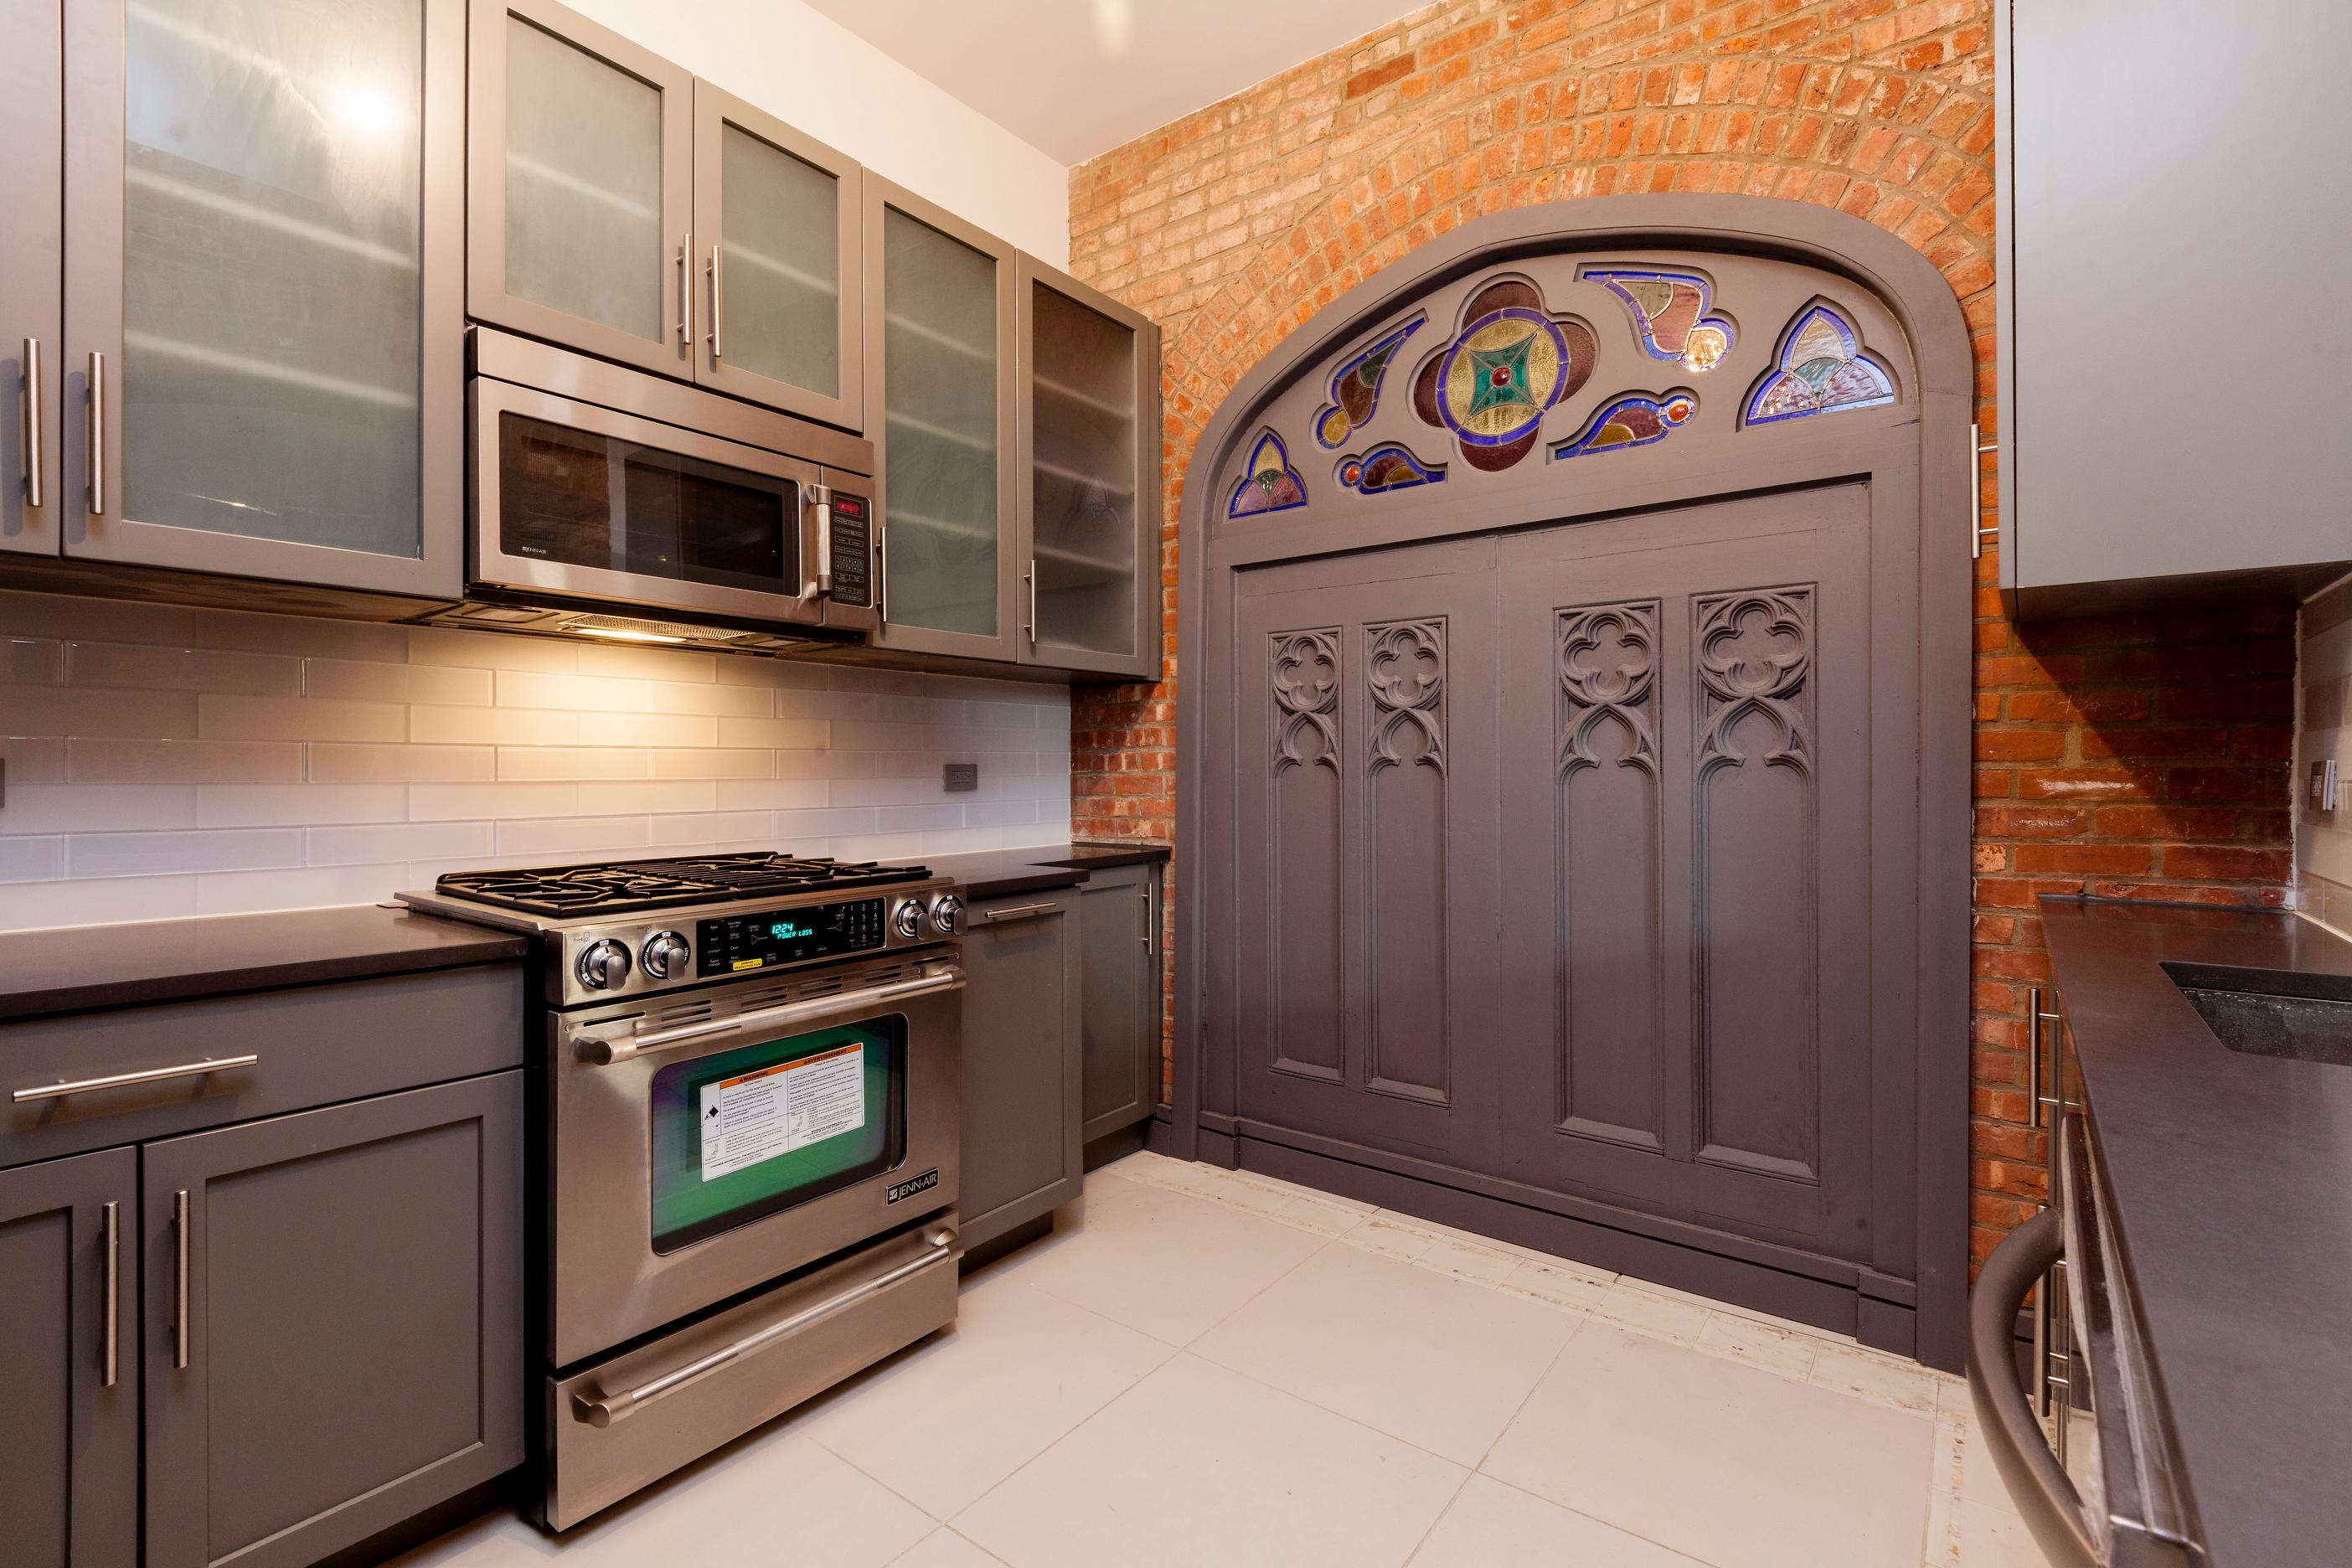 232 Adelphi Street, carlton mews church, kitchen, rentals